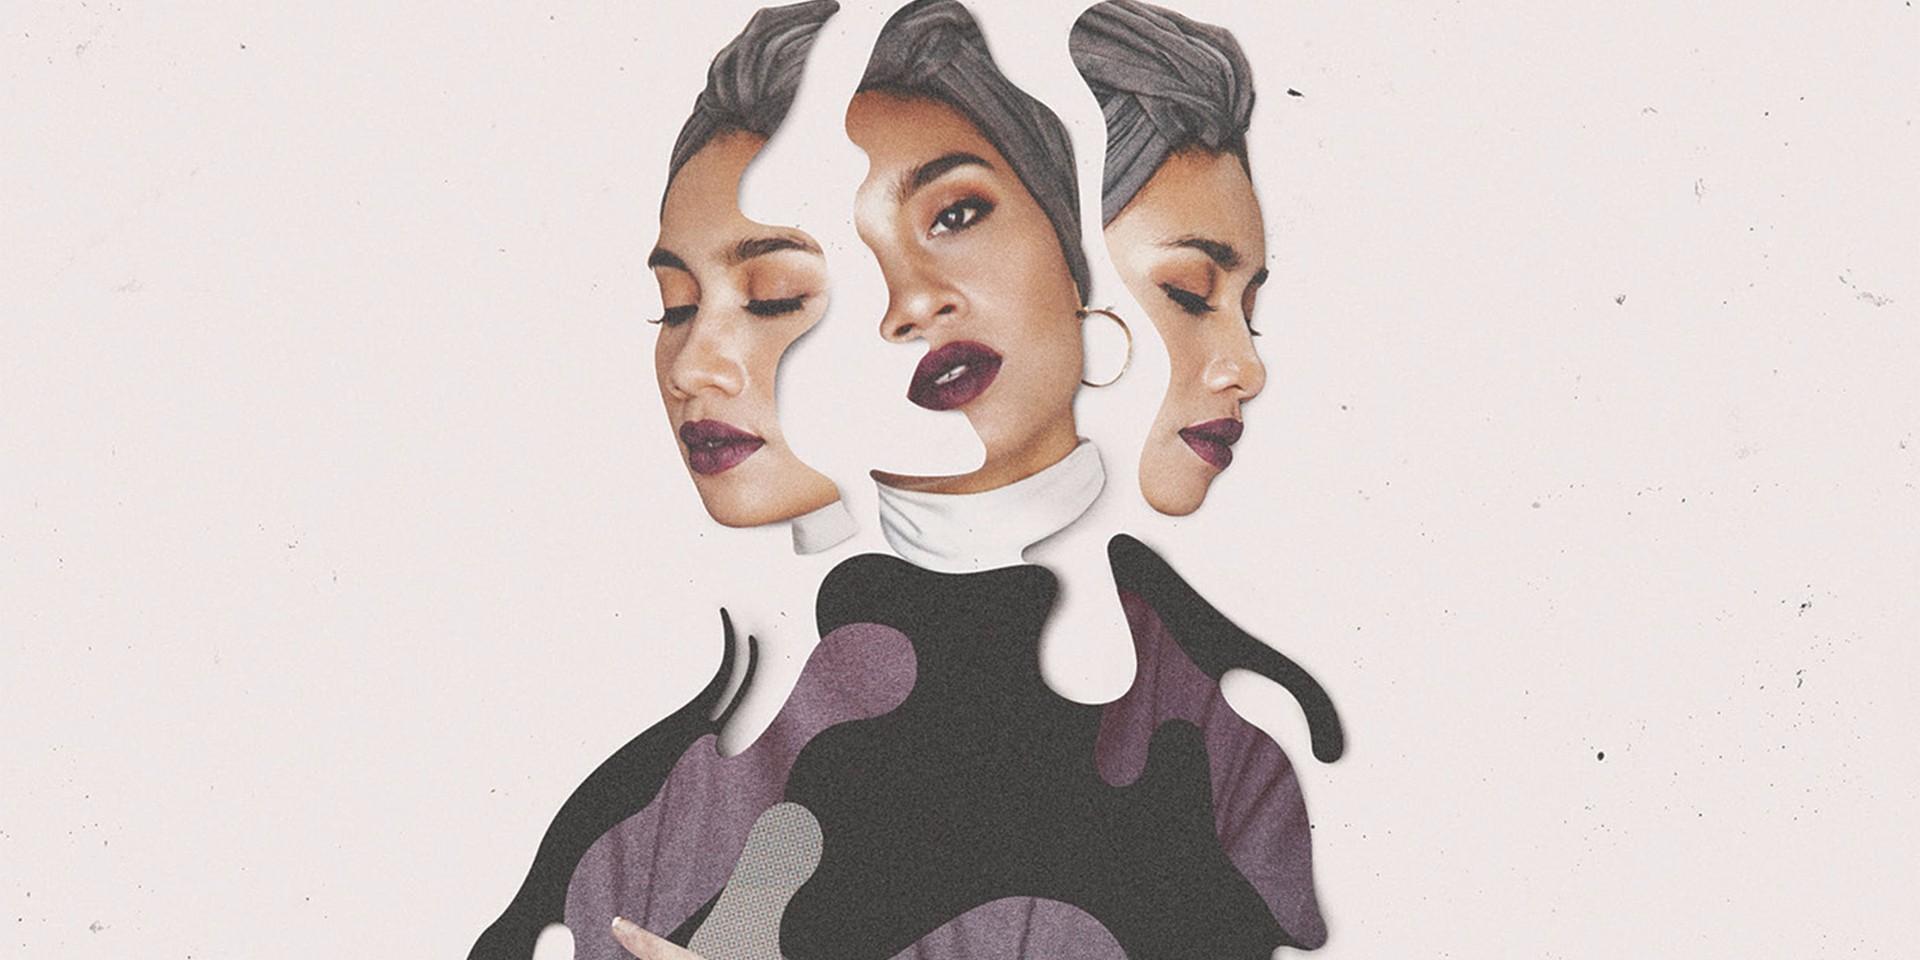 LISTEN: Stream Yuna's new album Chapters, featuring Jhene Aiko, Usher and DJ Premier